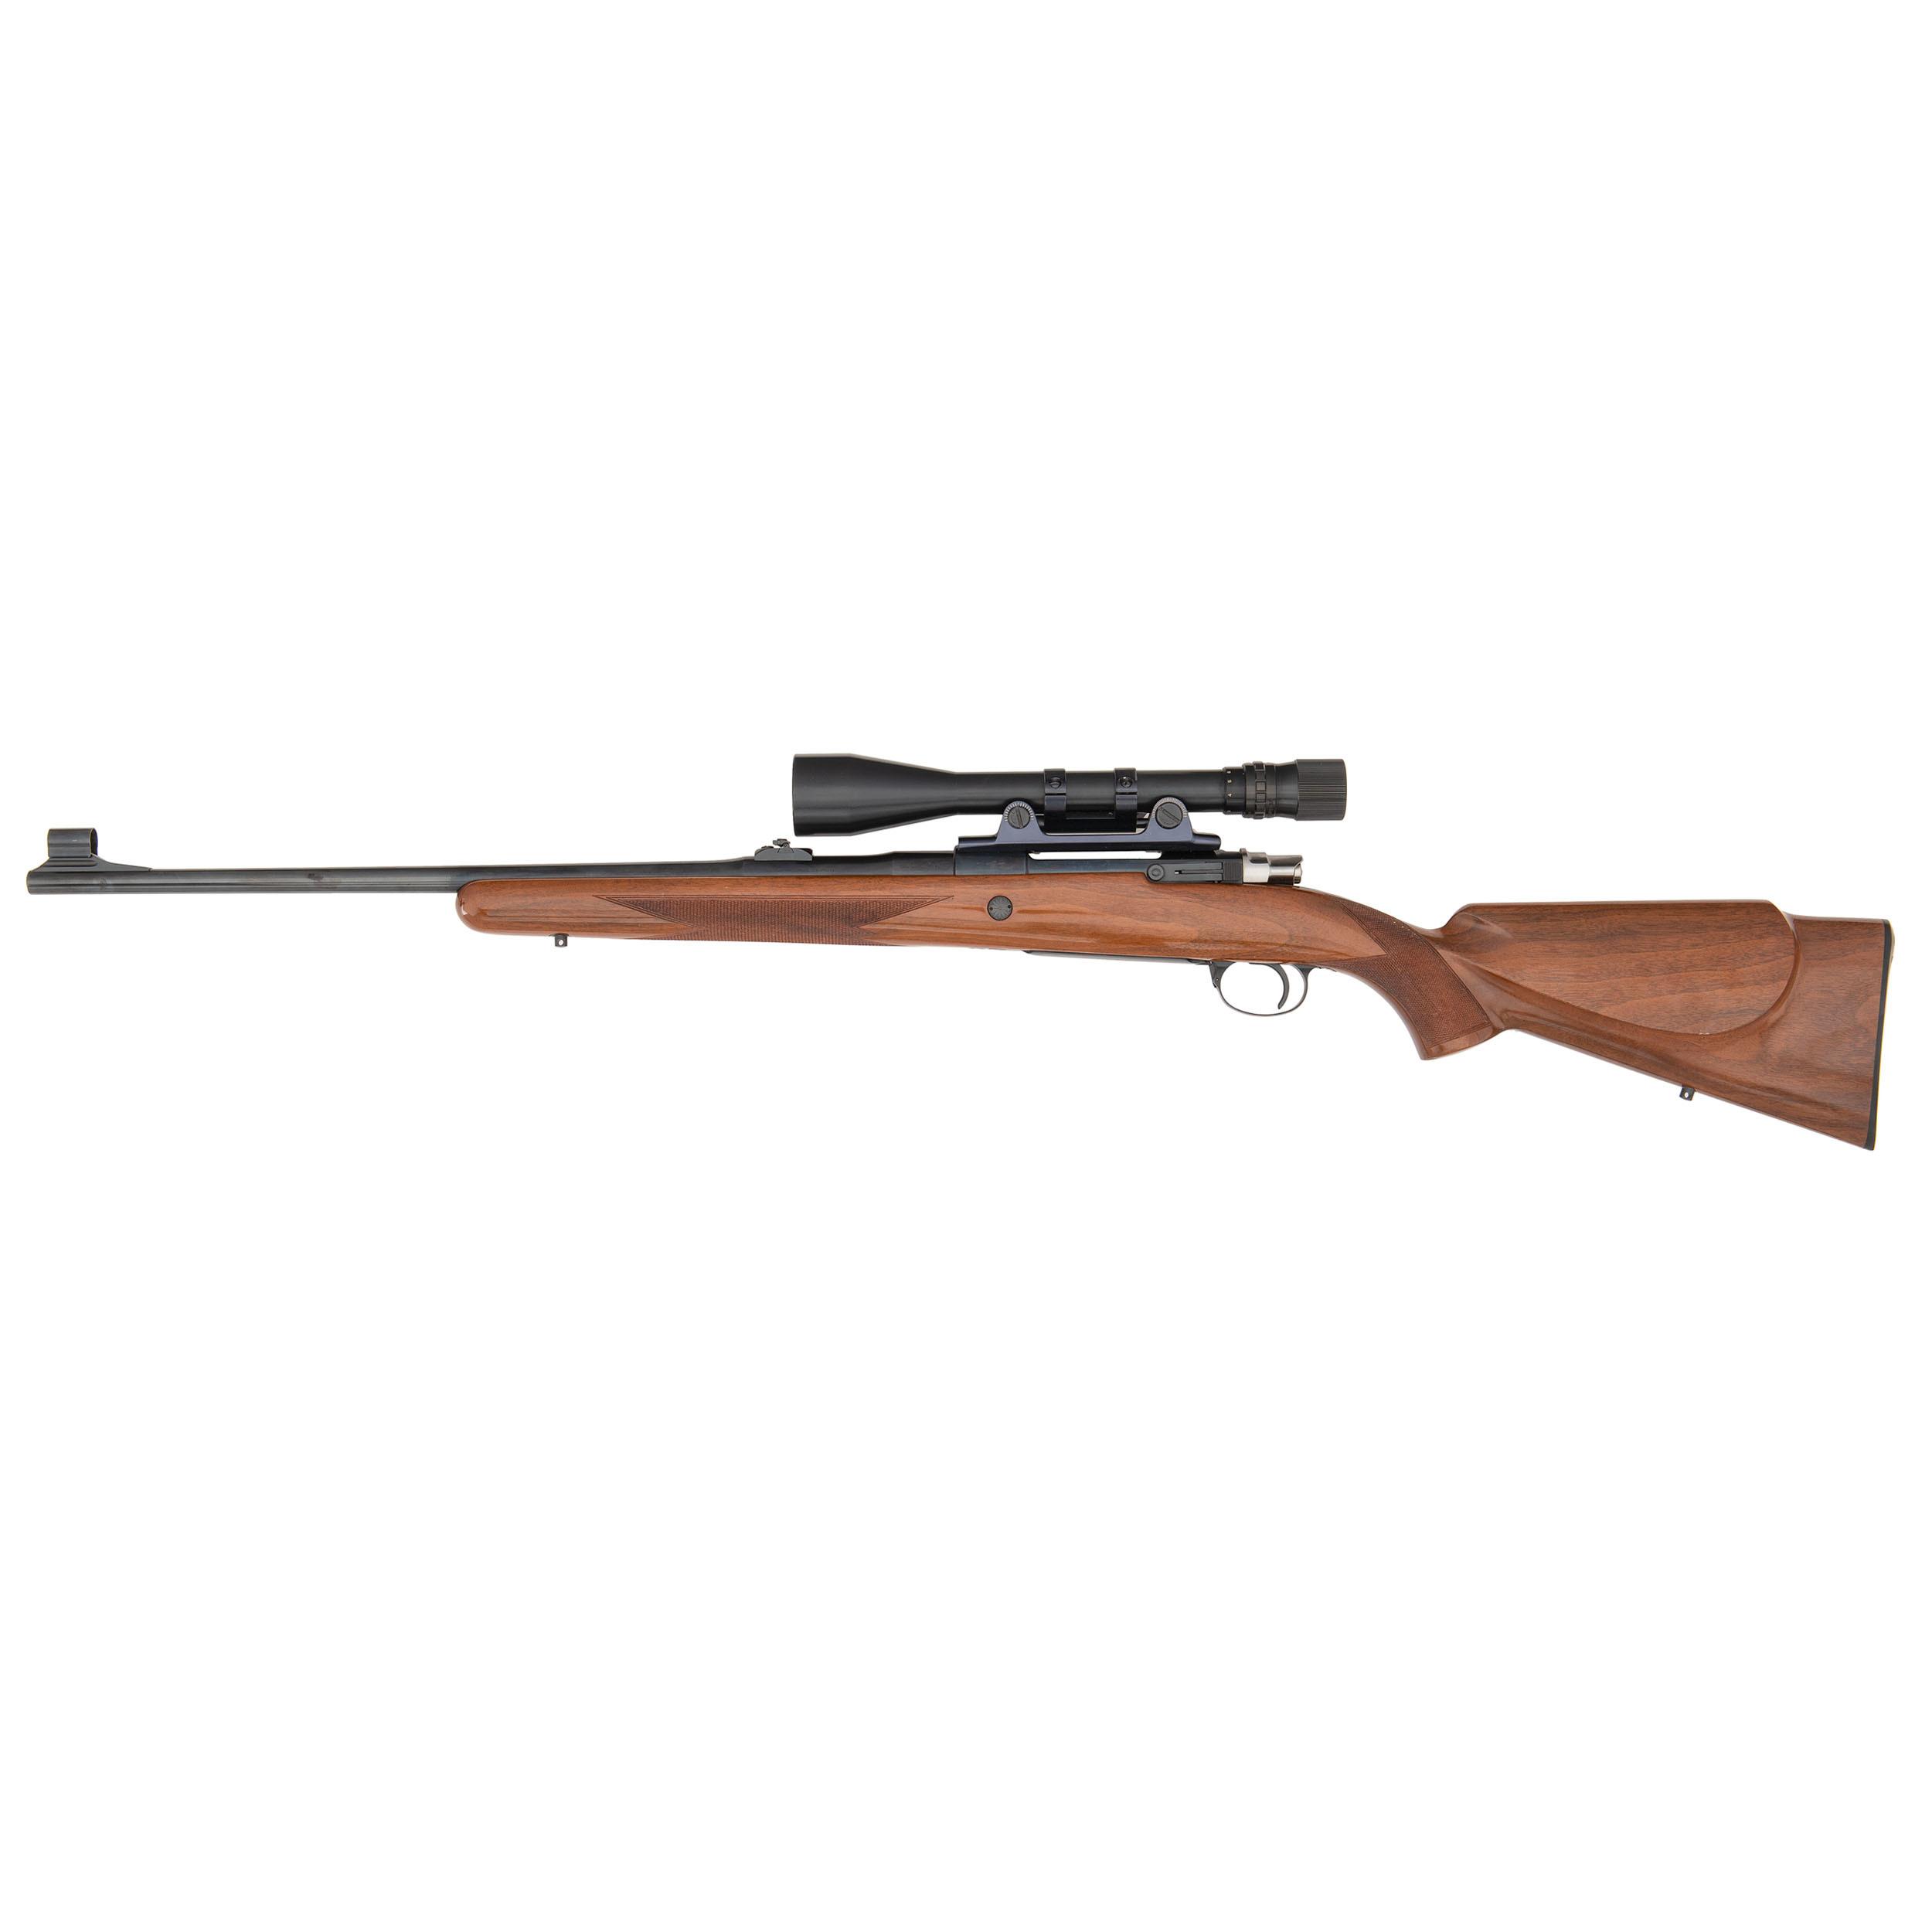 Belgian Browning FN High-Power Safari Grade Bolt Action Rifle